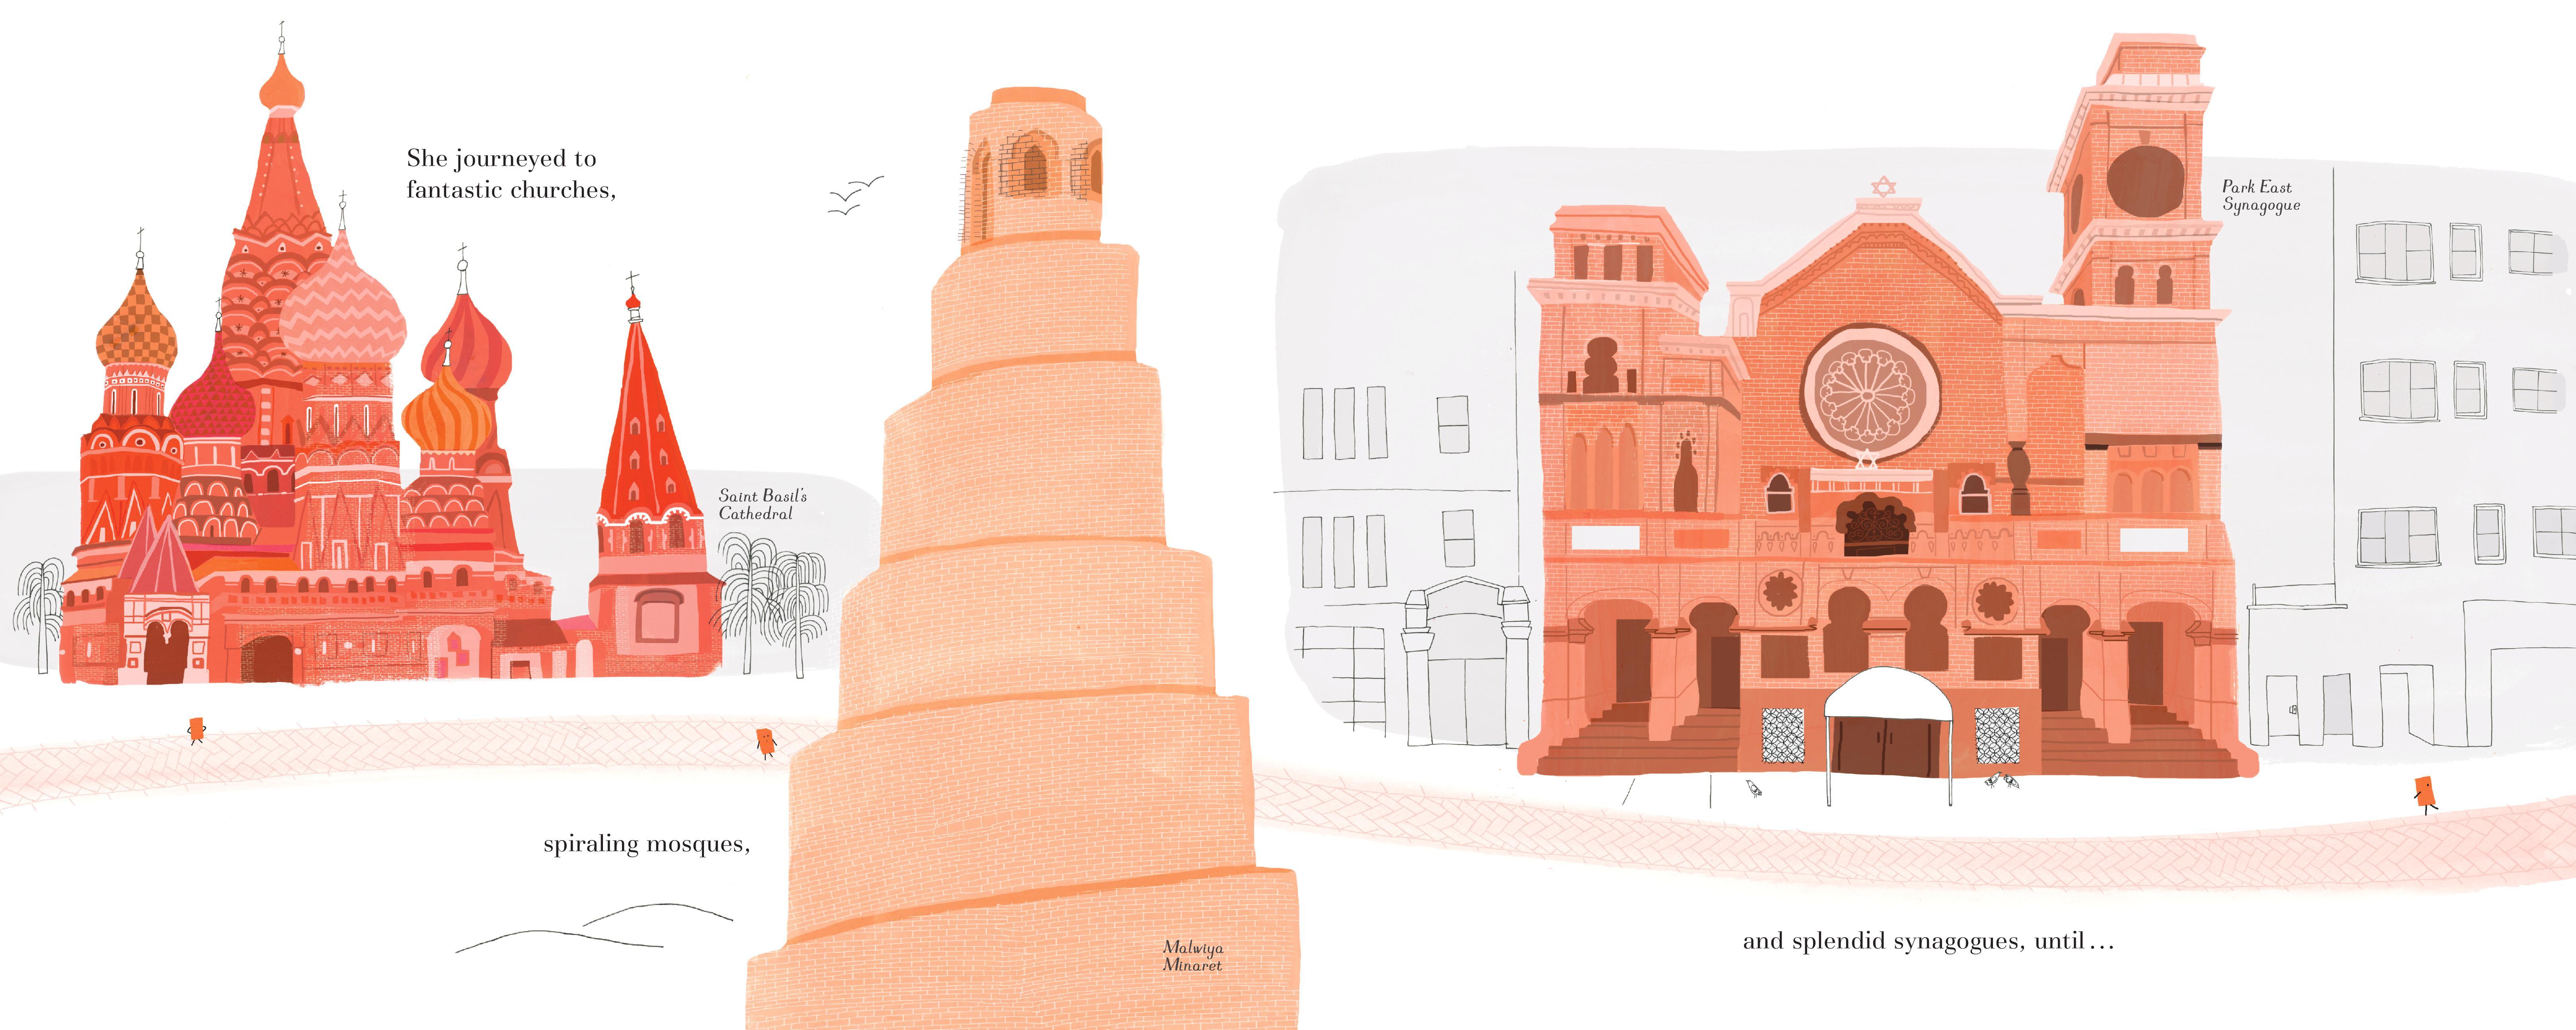 celebrate-picture-books-picture-book-review-brick-who-found-herself-in-architecture-churches